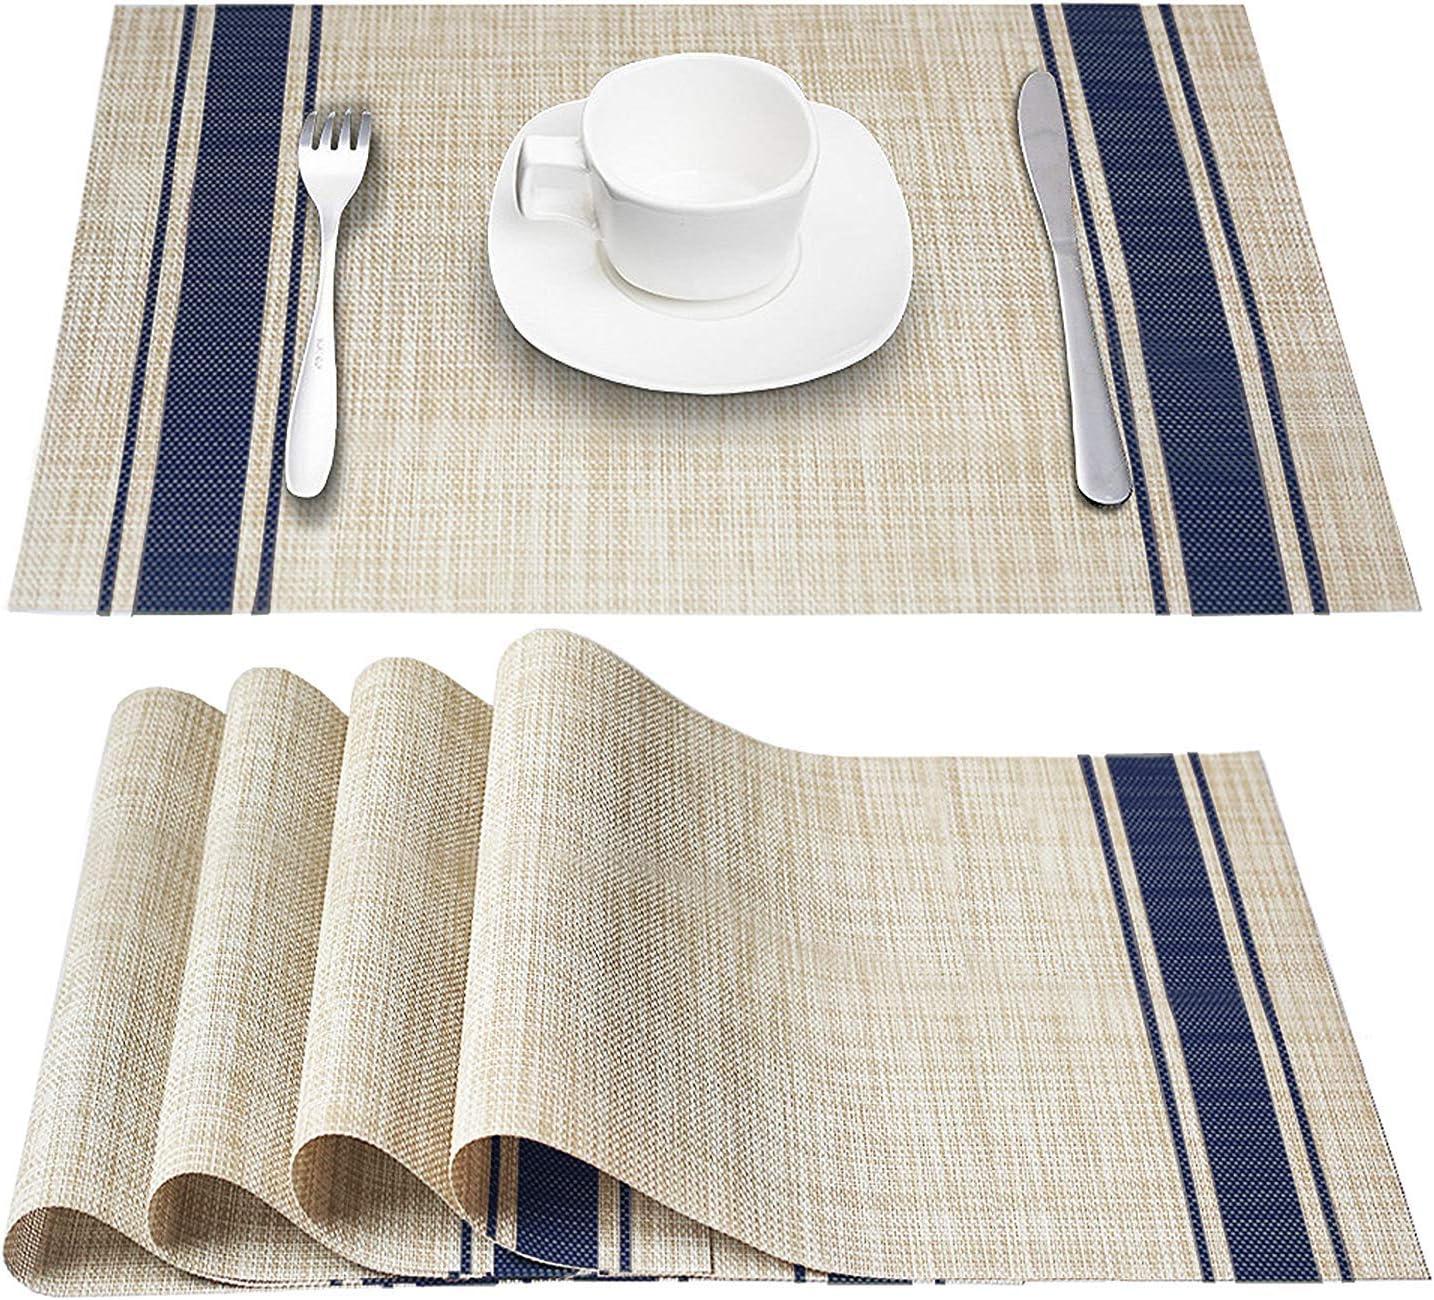 DACHUI Placemats, Heat-Resistant Placemats Stain Resistant Anti-Skid Washable PVC Table Mats Woven Vinyl Placemats, Set of 6 (Blue)